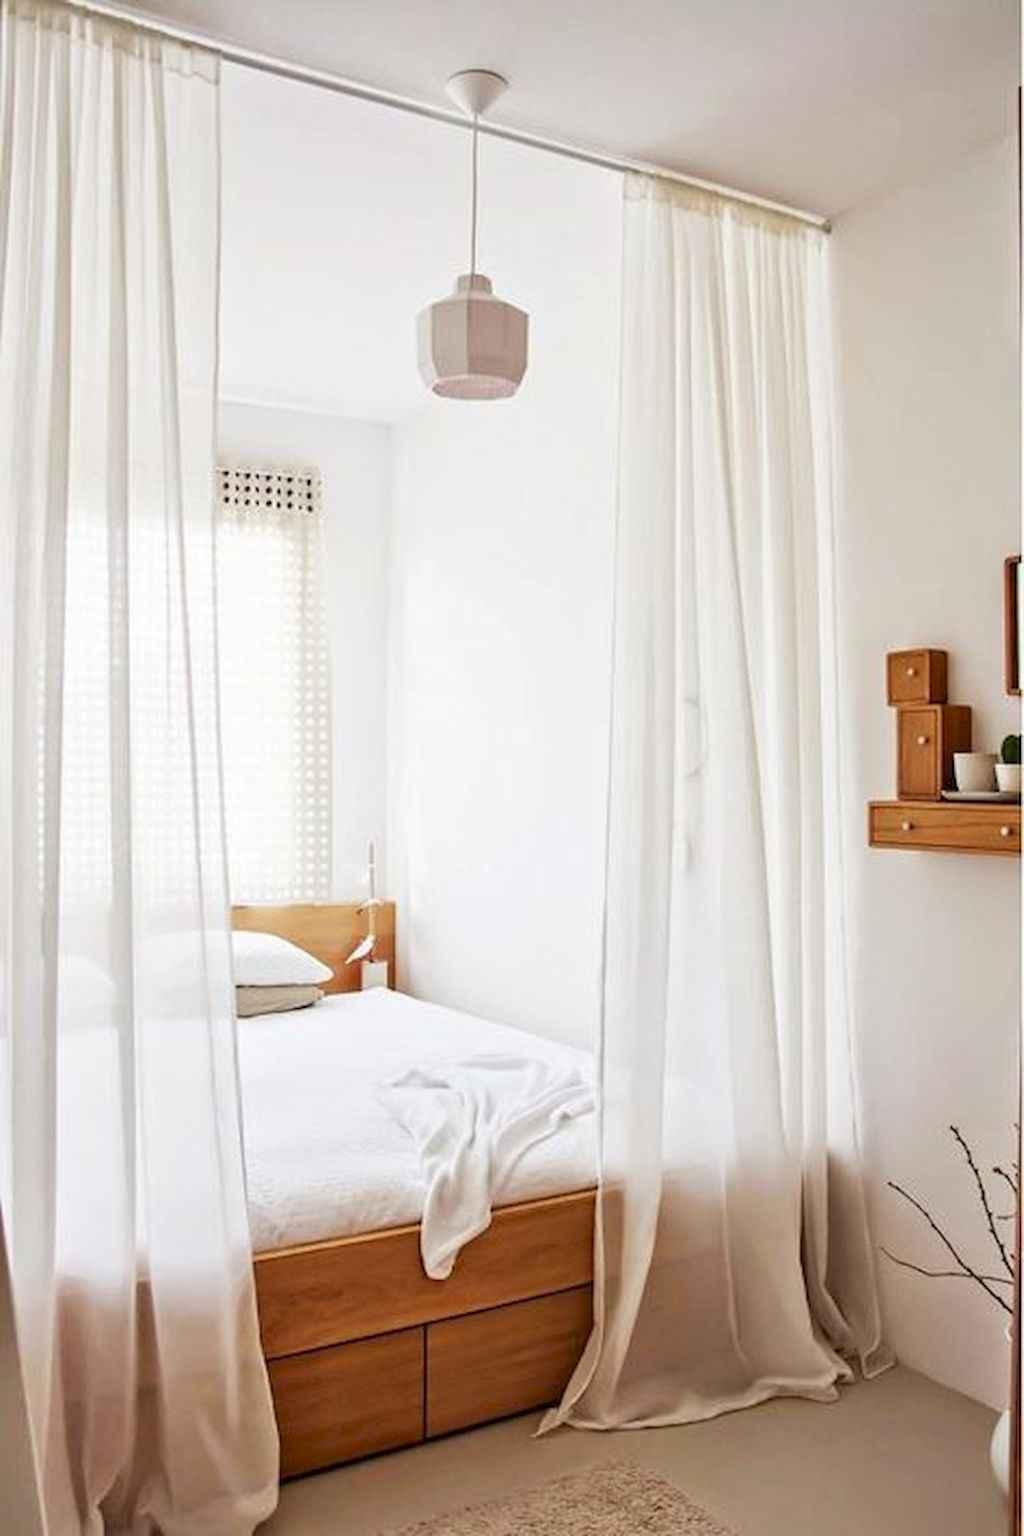 Incredible master bedroom ideas (61)